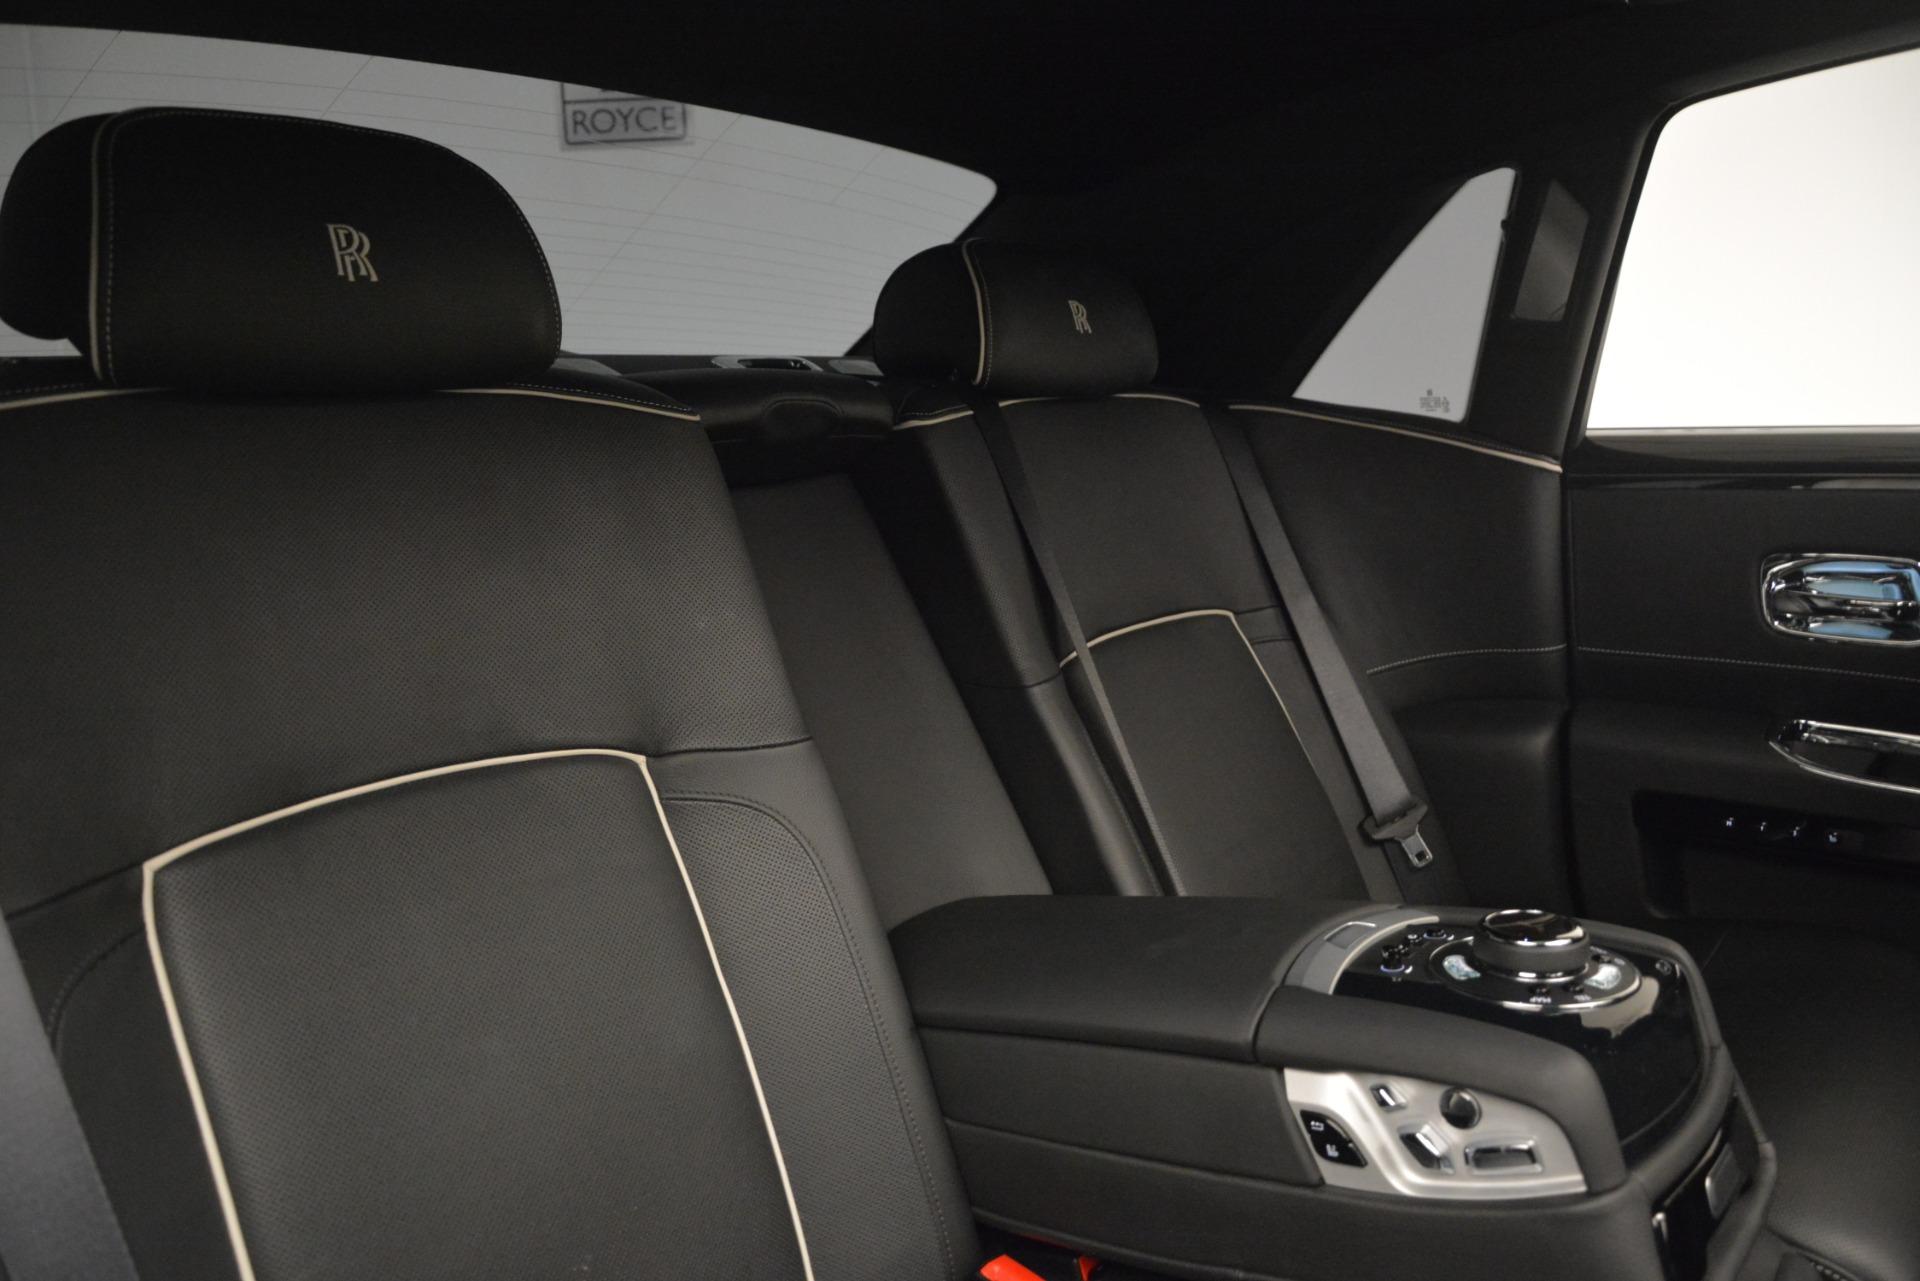 Used 2014 Rolls-Royce Ghost V-Spec For Sale In Westport, CT 2989_p25